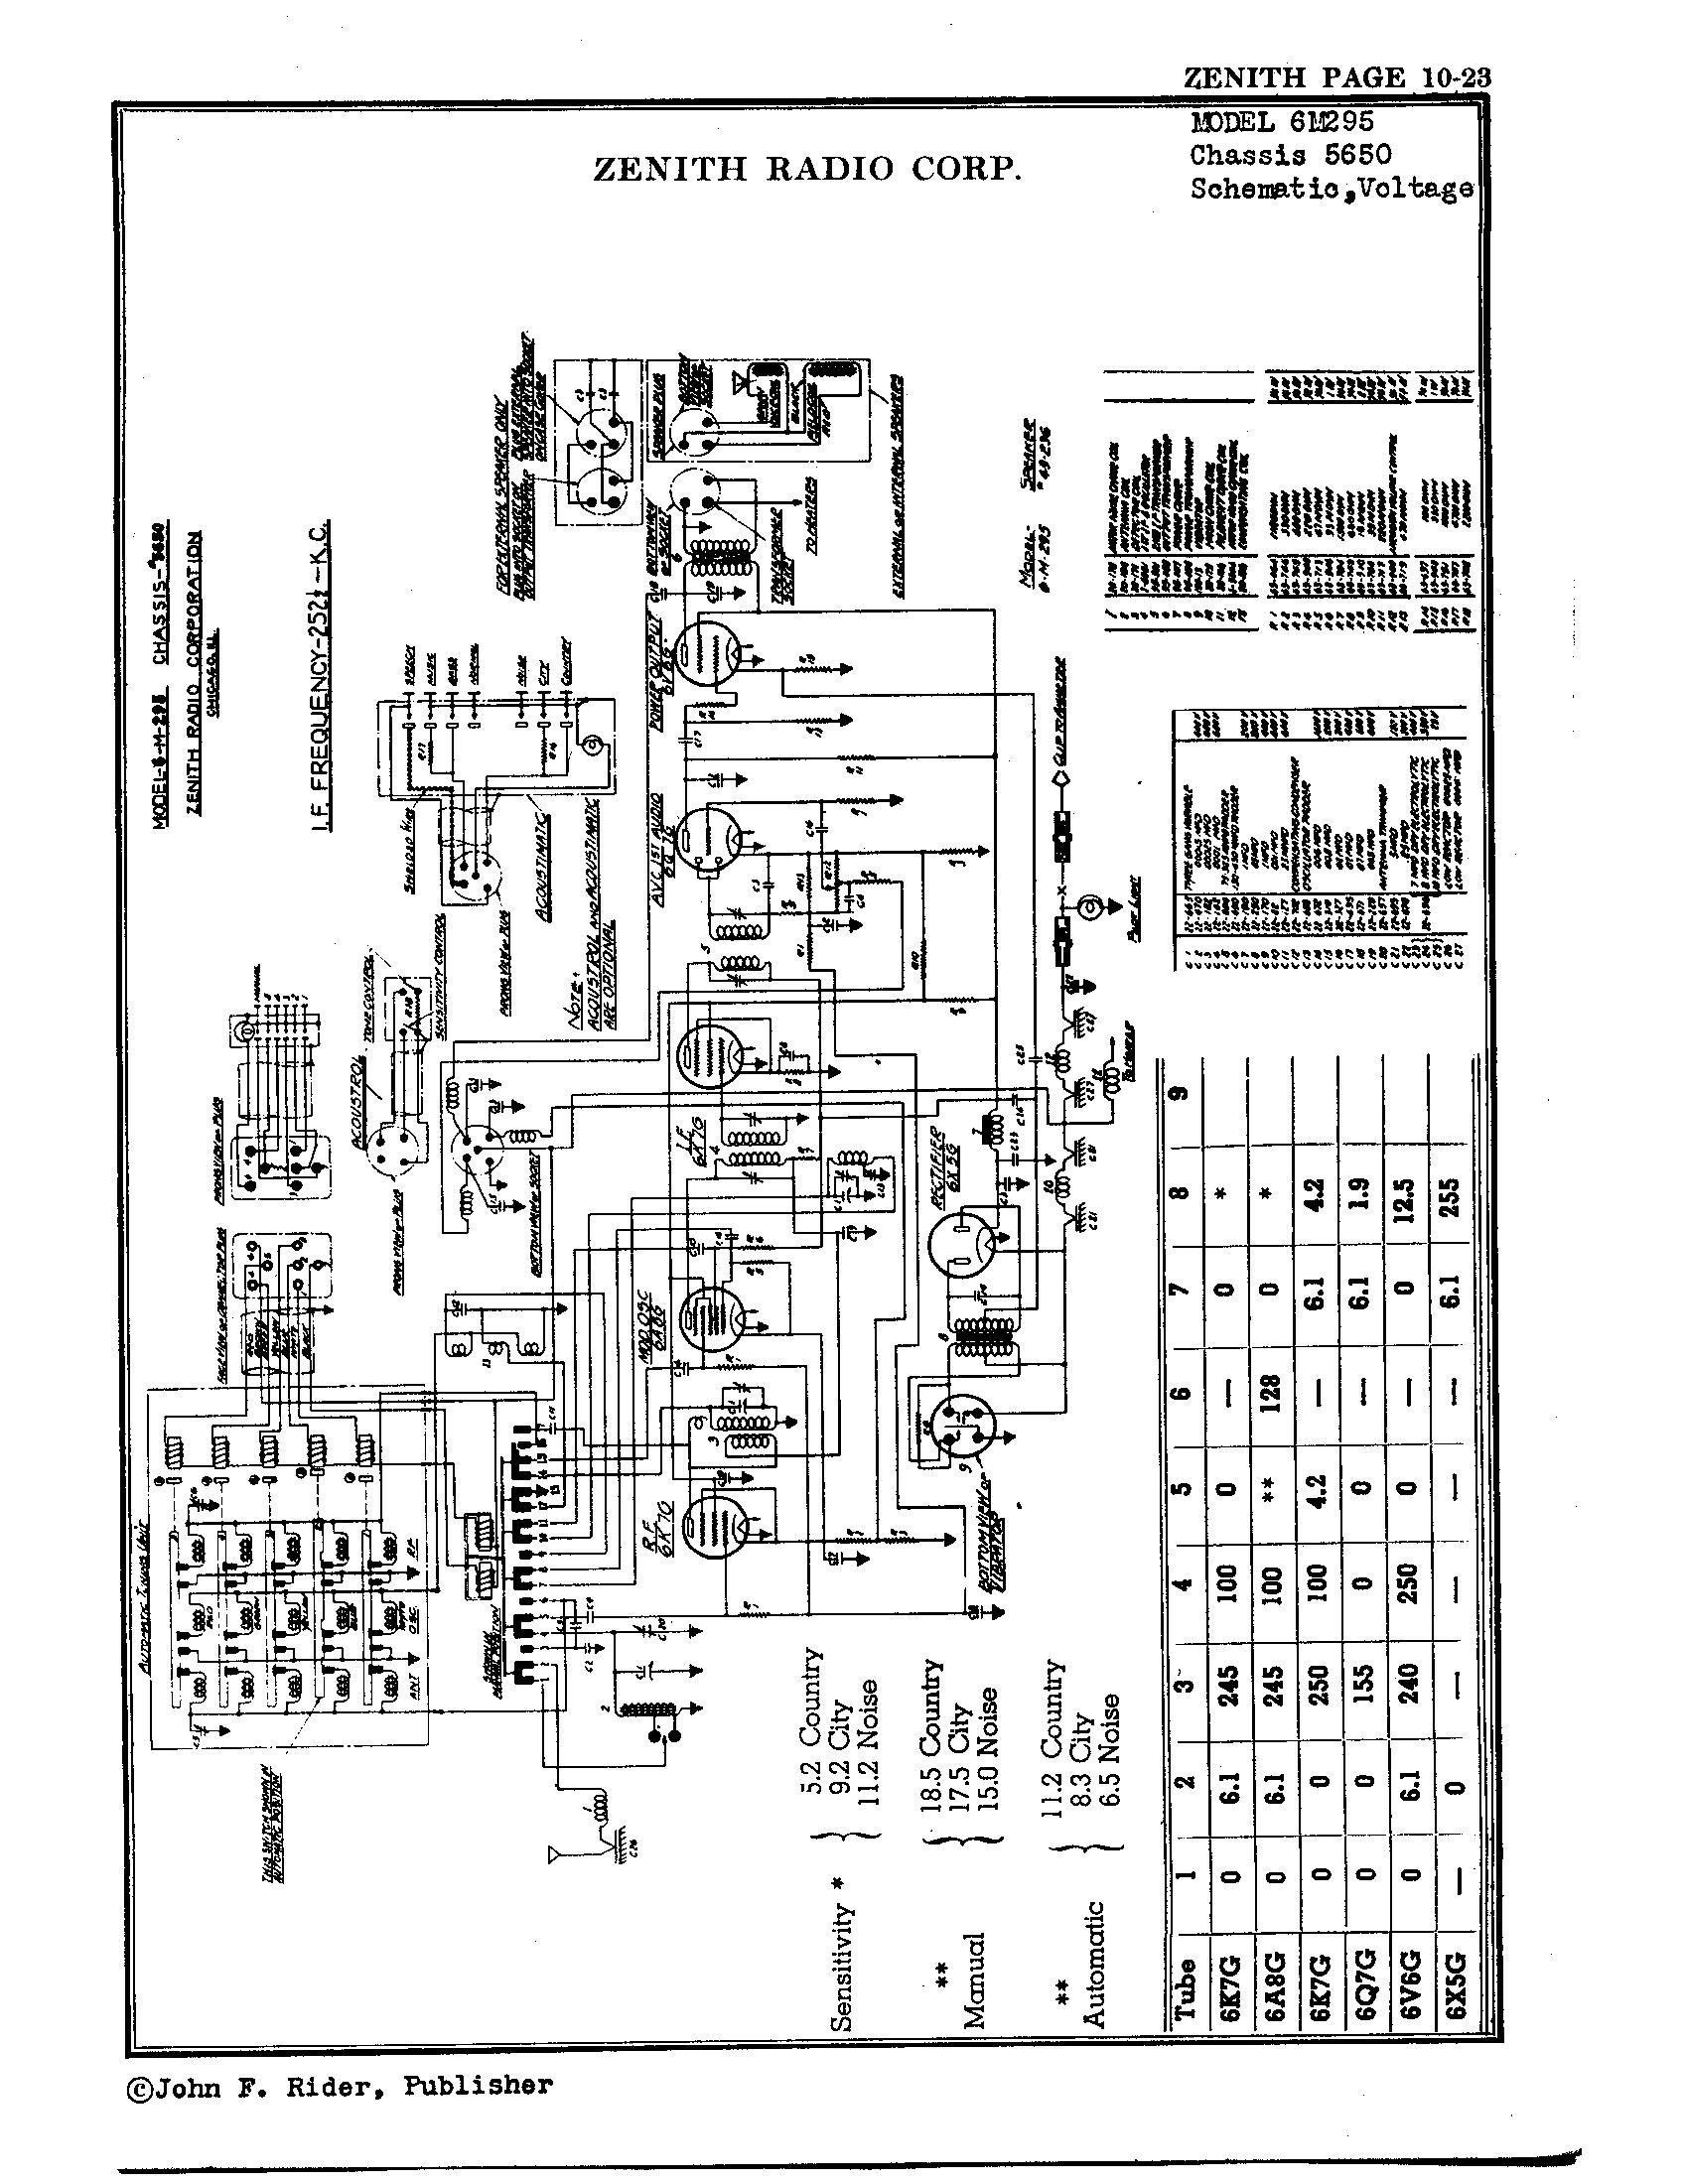 Zenith Radio Corp 6m295